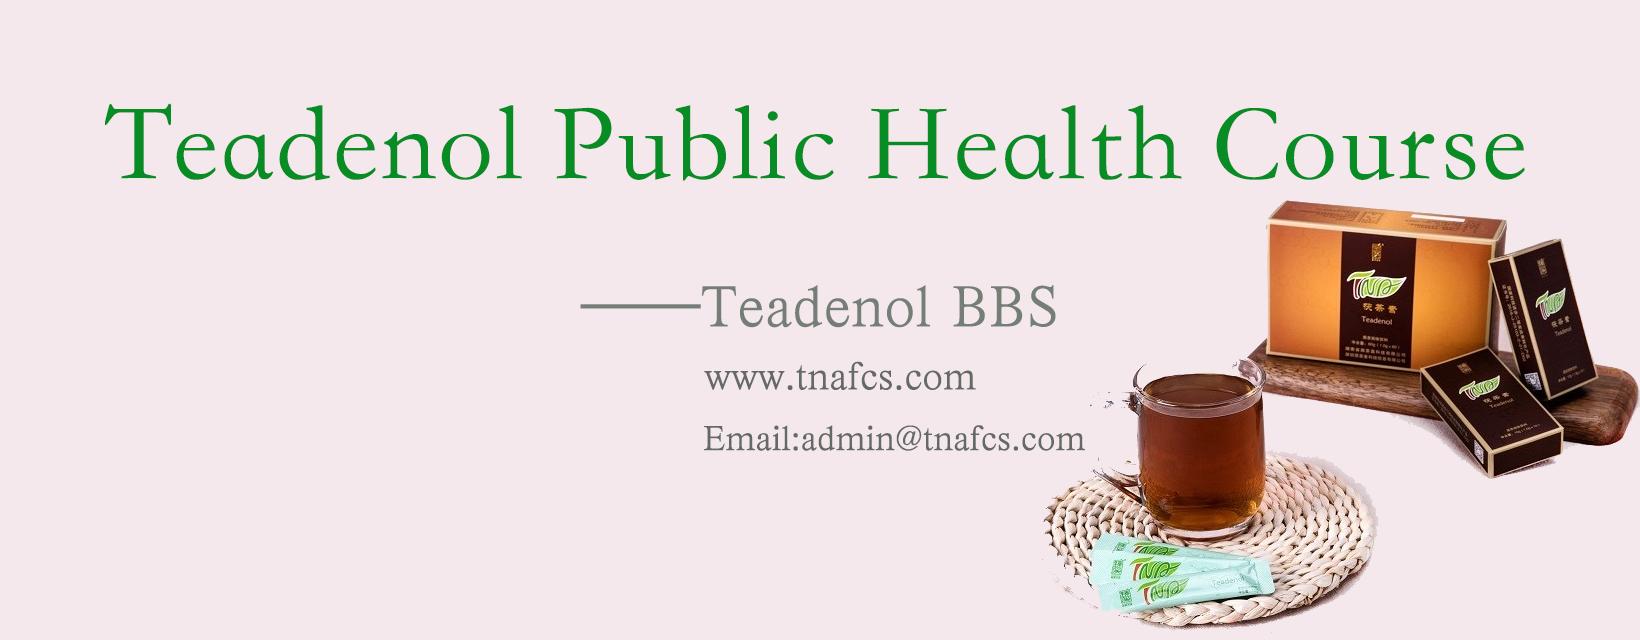 Teadenol-Public-Health-Course.jpg